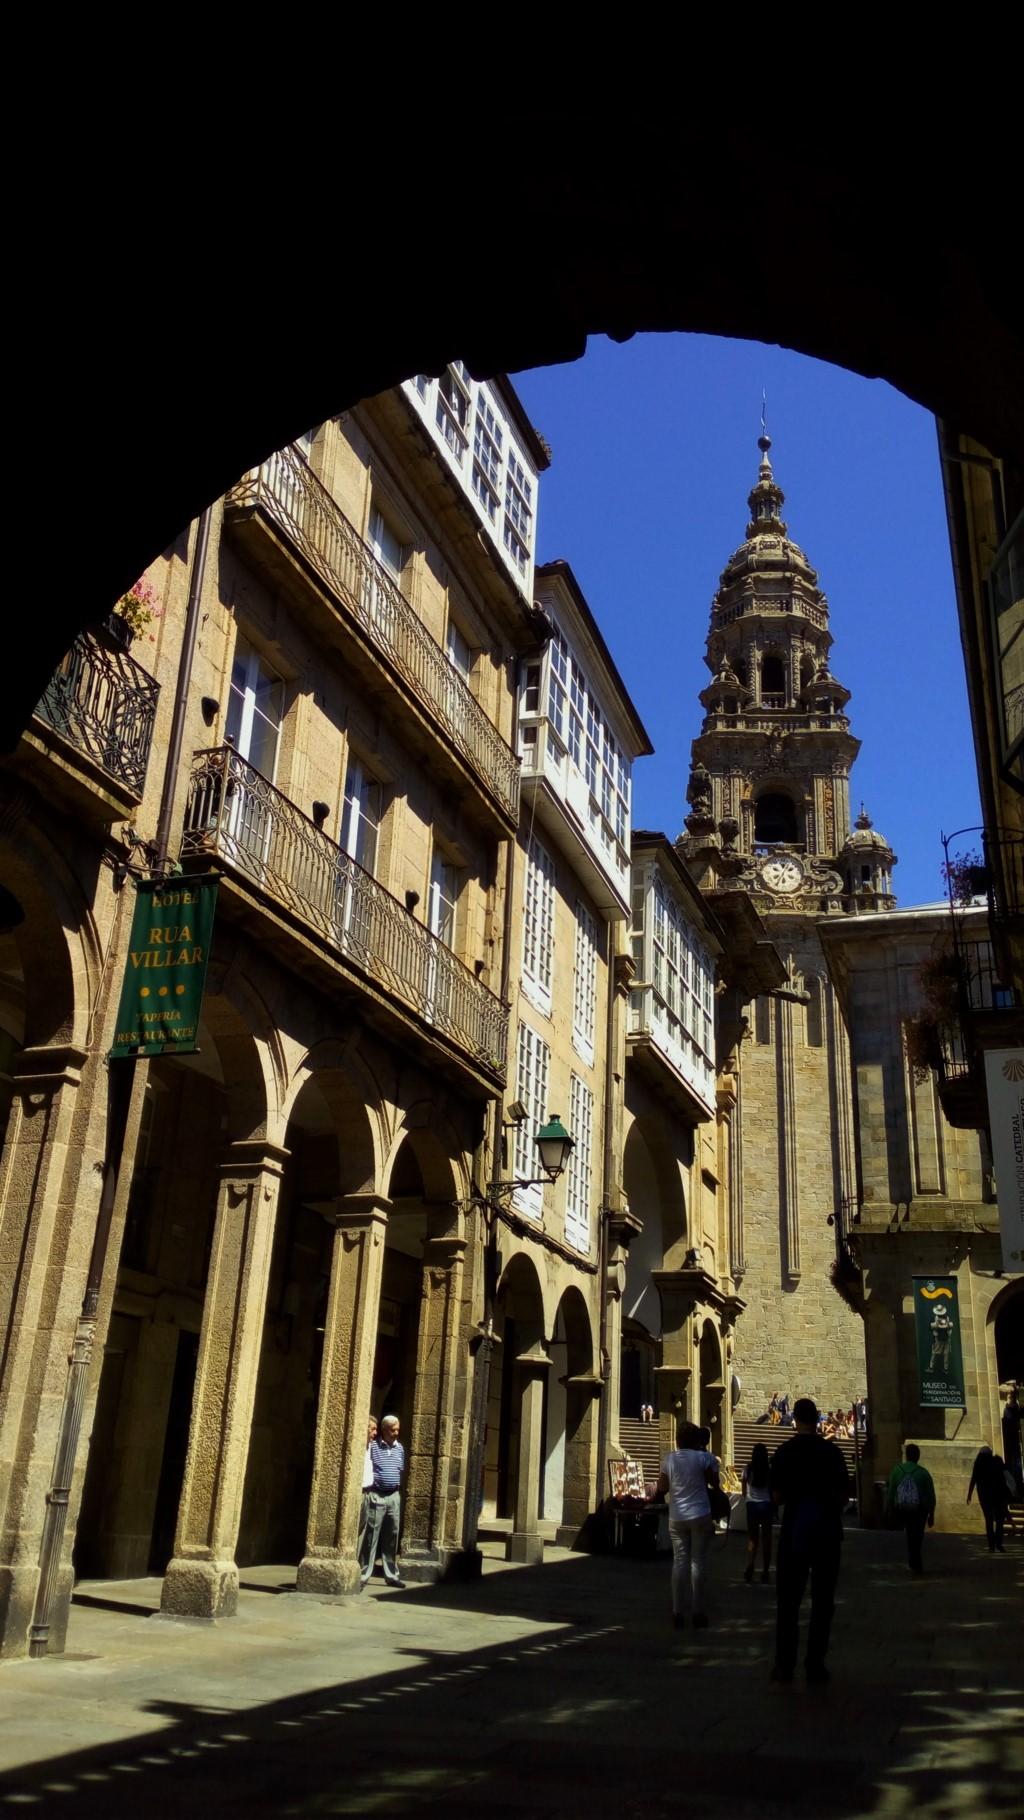 Tramo 15 - Rúa del Villar, al fondo Torre de la Berenguela o del Reloj de la Catedral de Santiago